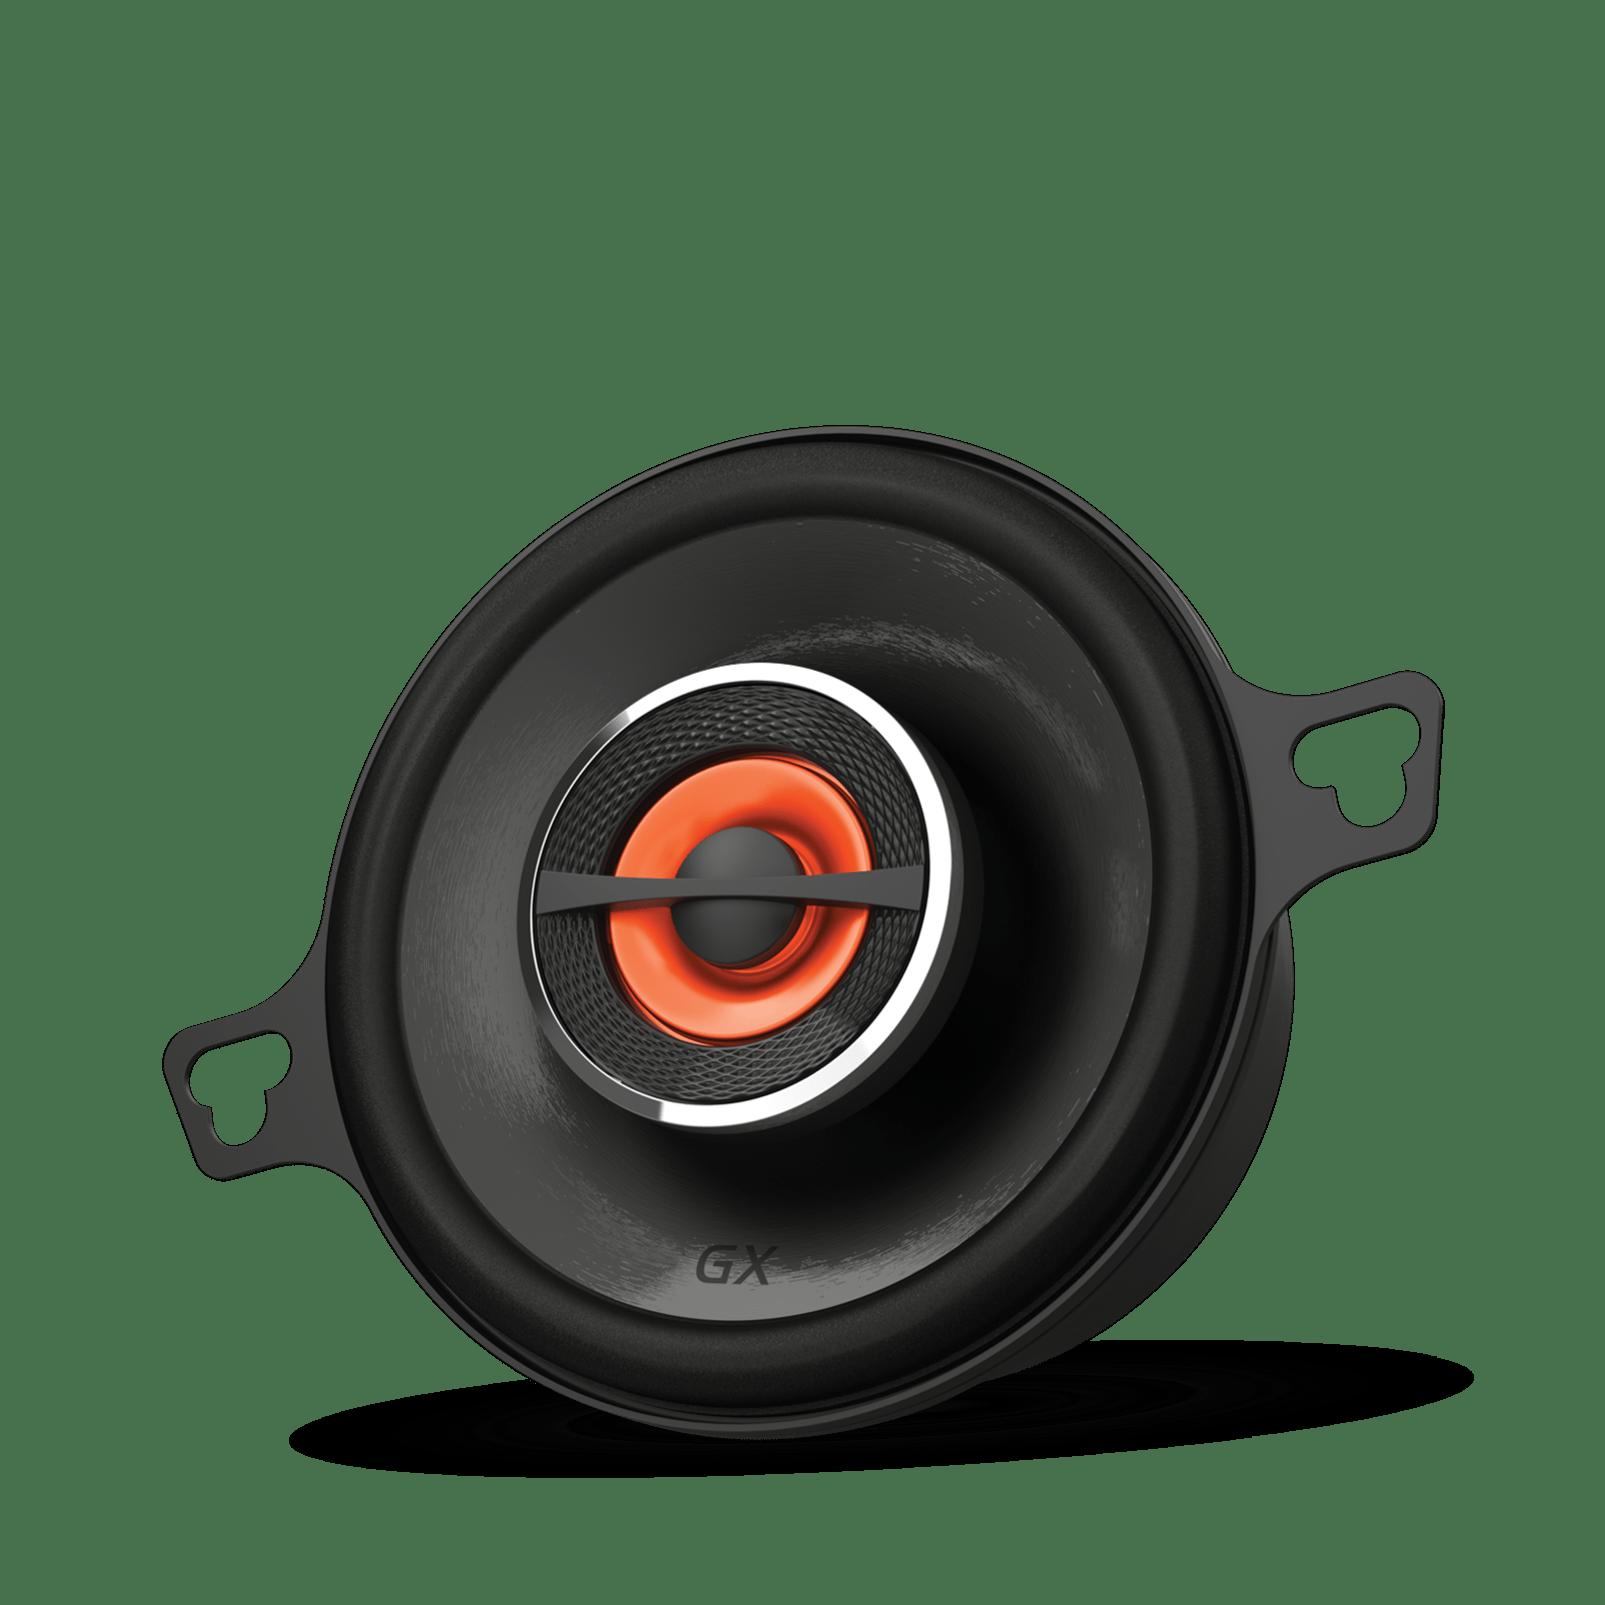 hight resolution of  jbl com car speakers gx302 html cgid car speakers dwvar gx302 color black global current productsupporturl productid gx302 orderable true